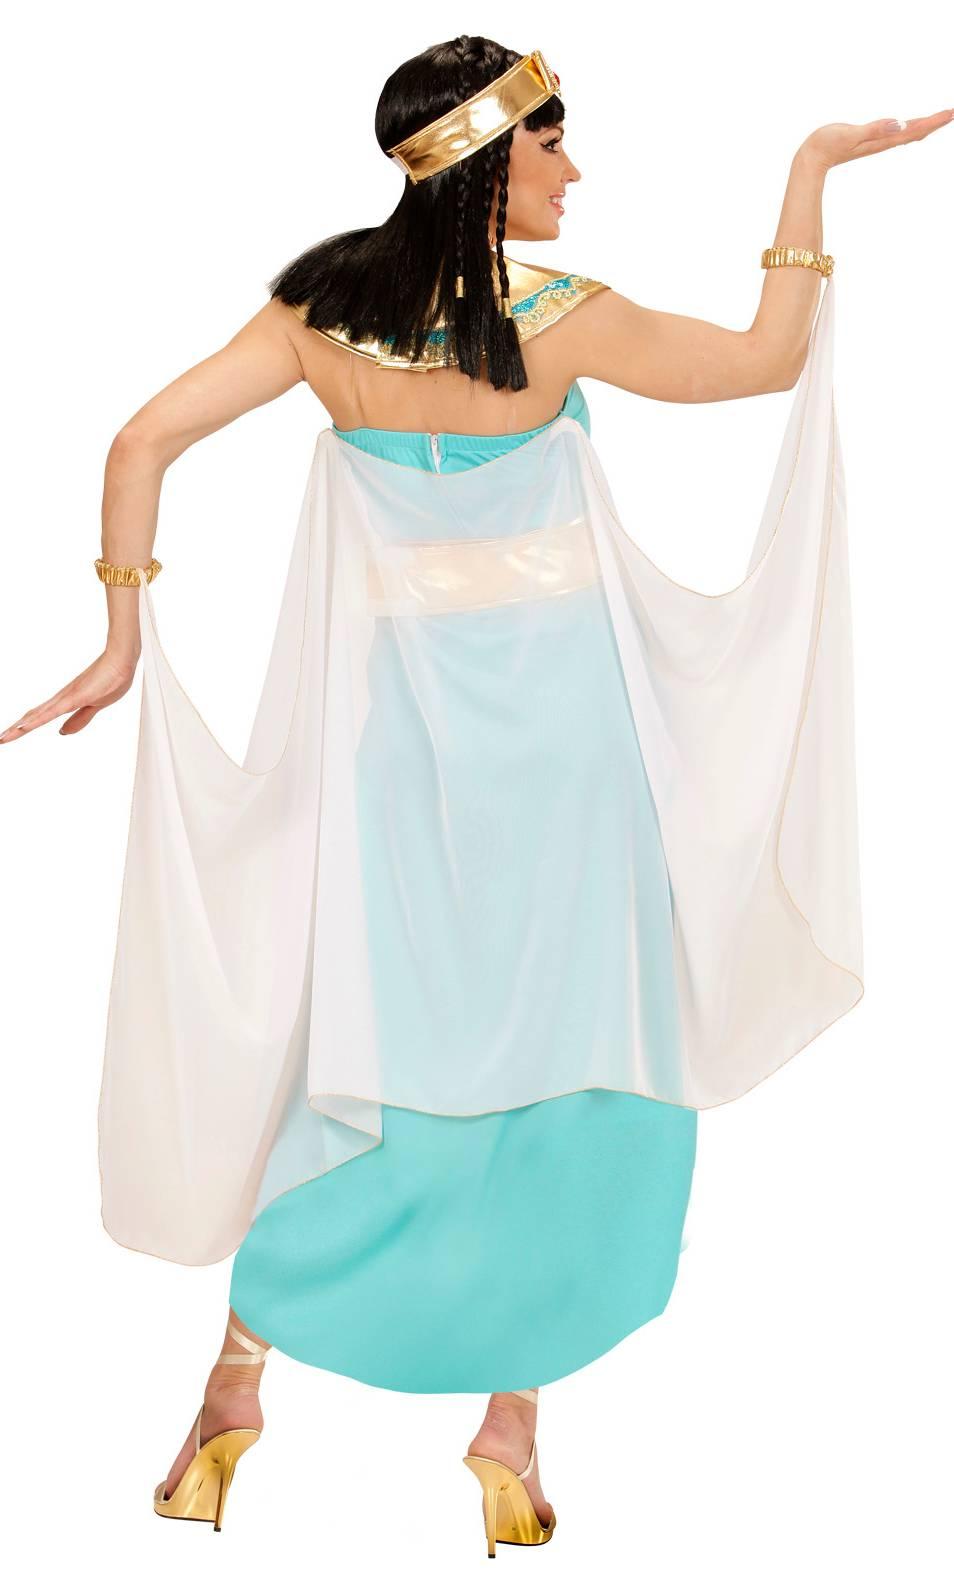 Costume-de-Cléopâtre-femme-en-grande-Taille-2